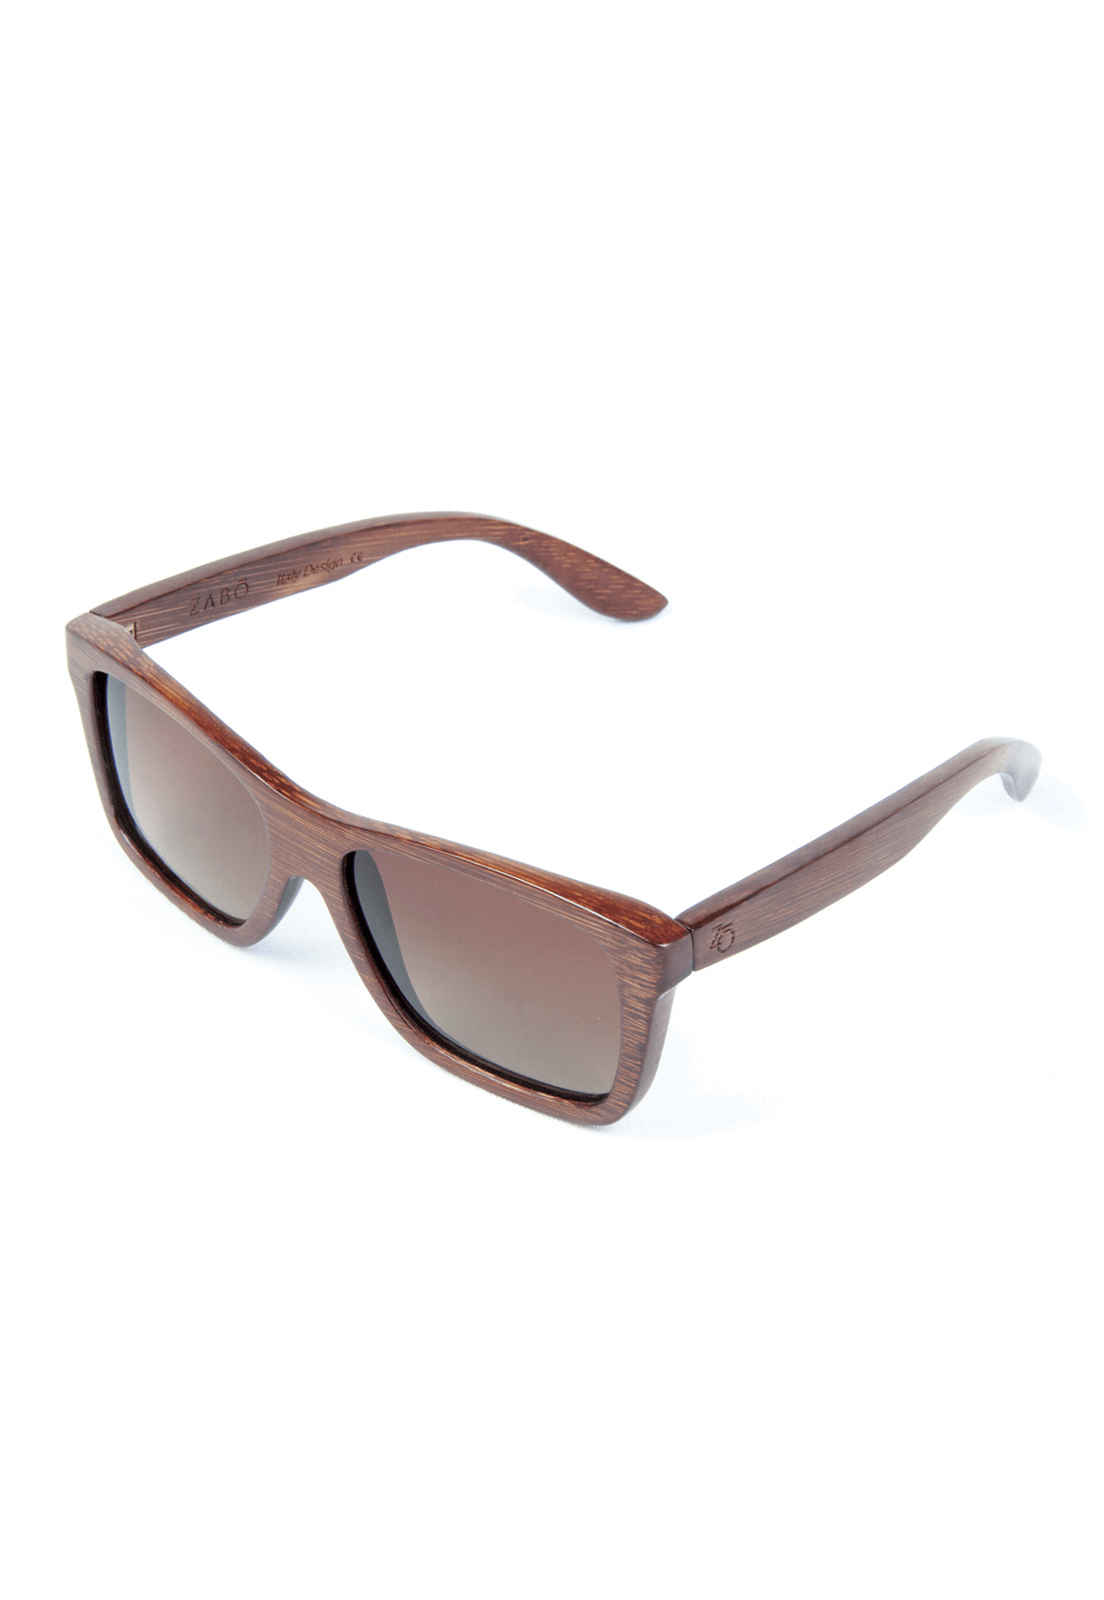 172a68acf Óculos de Sol Polarizado em Madeira Bambu Zabô Atacama – Lente Brown